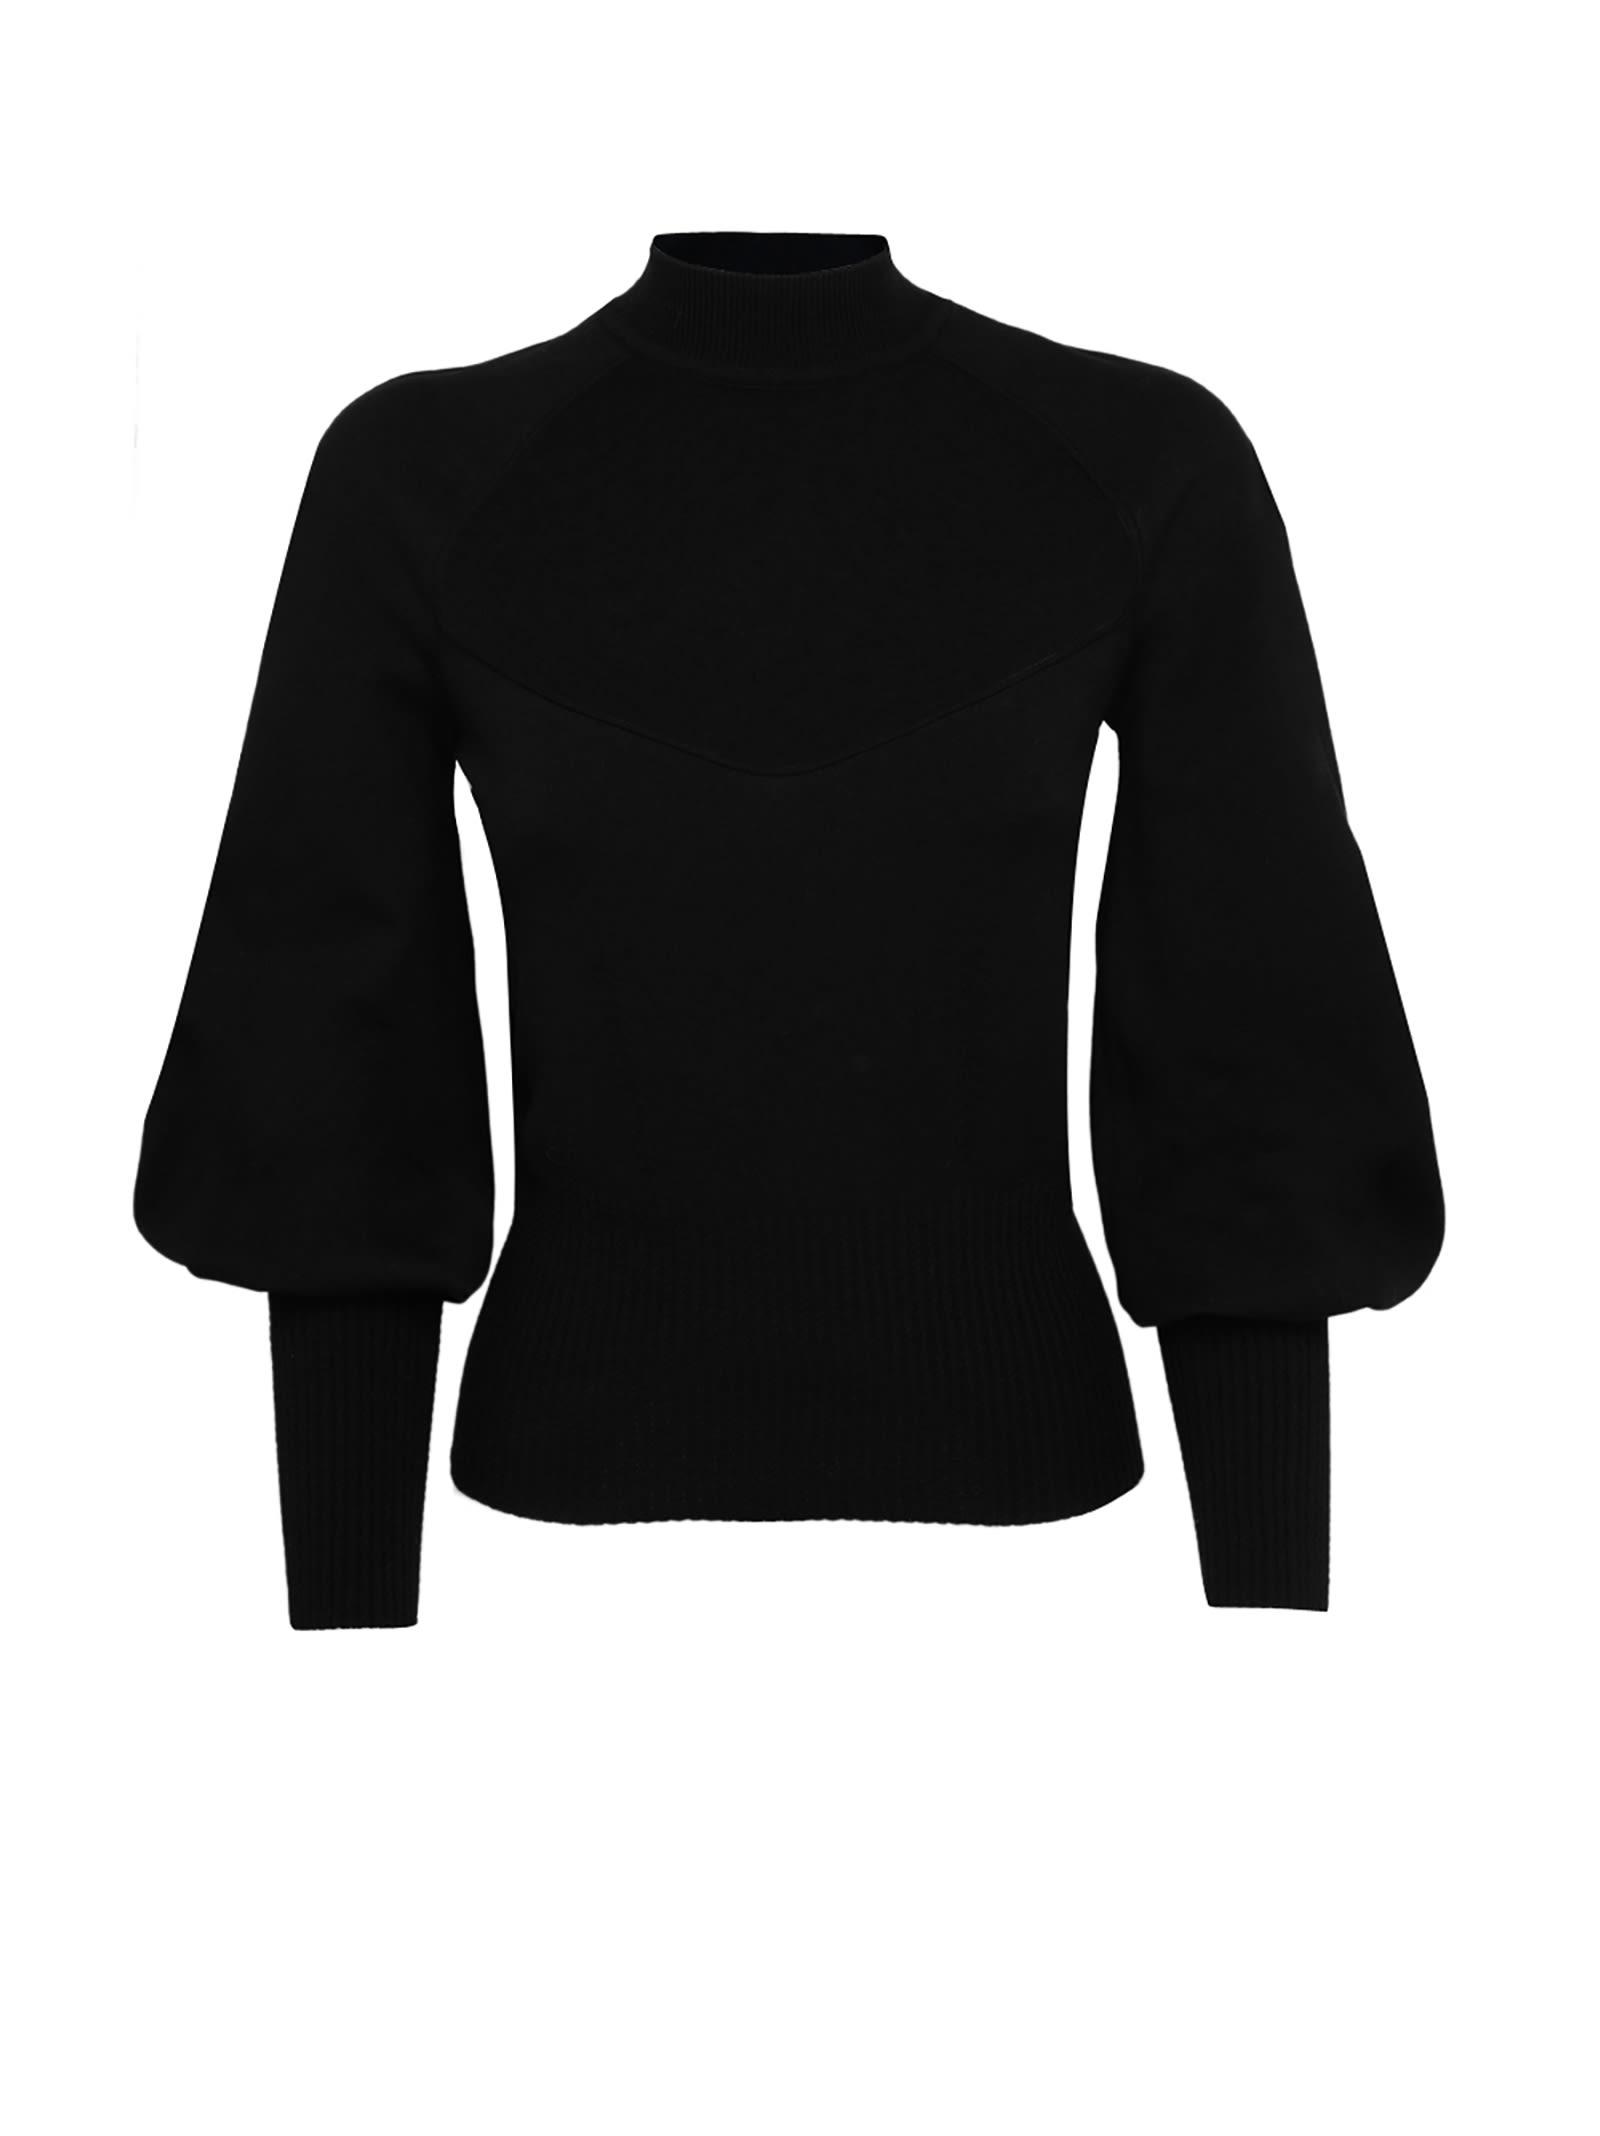 Black High Neck Knitwear